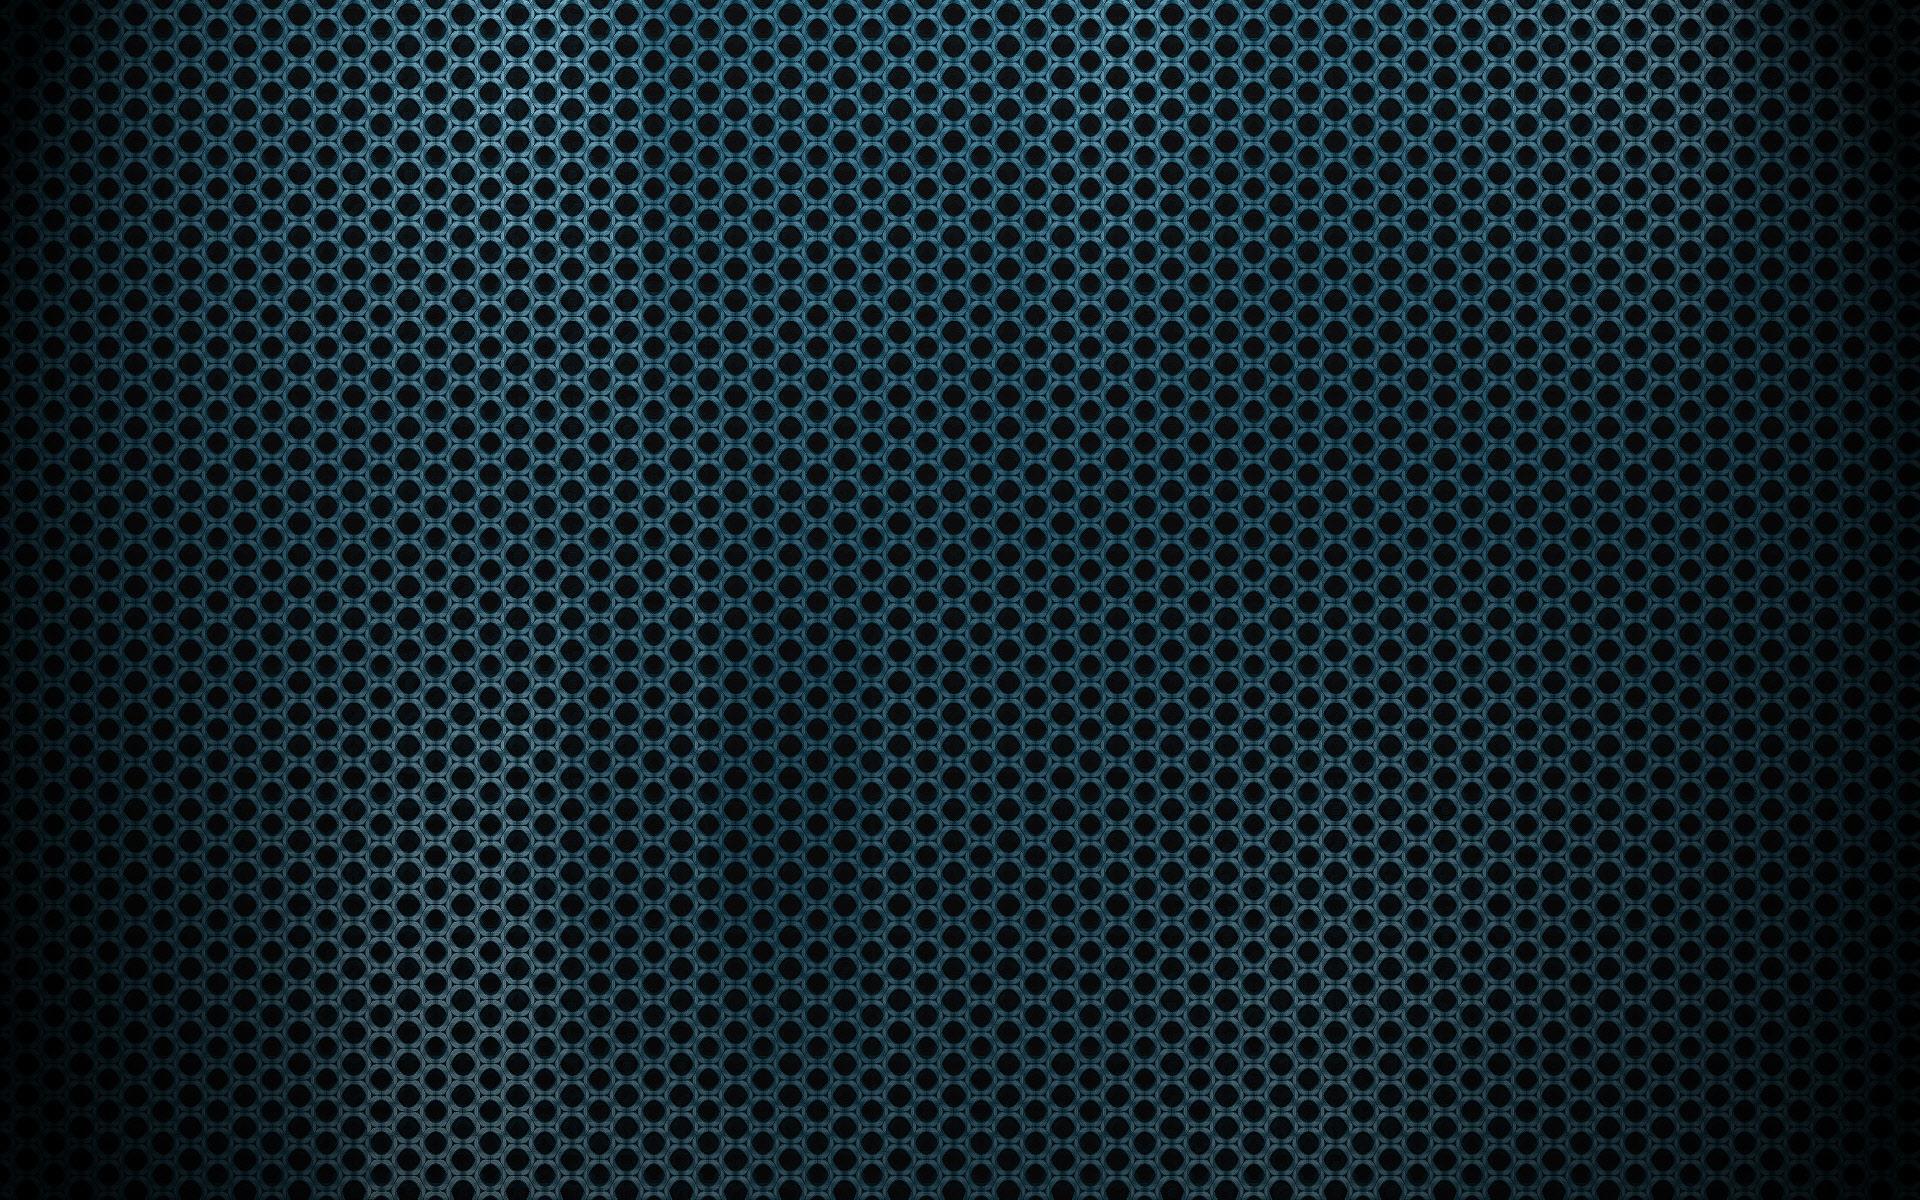 Perforated Blue Metal